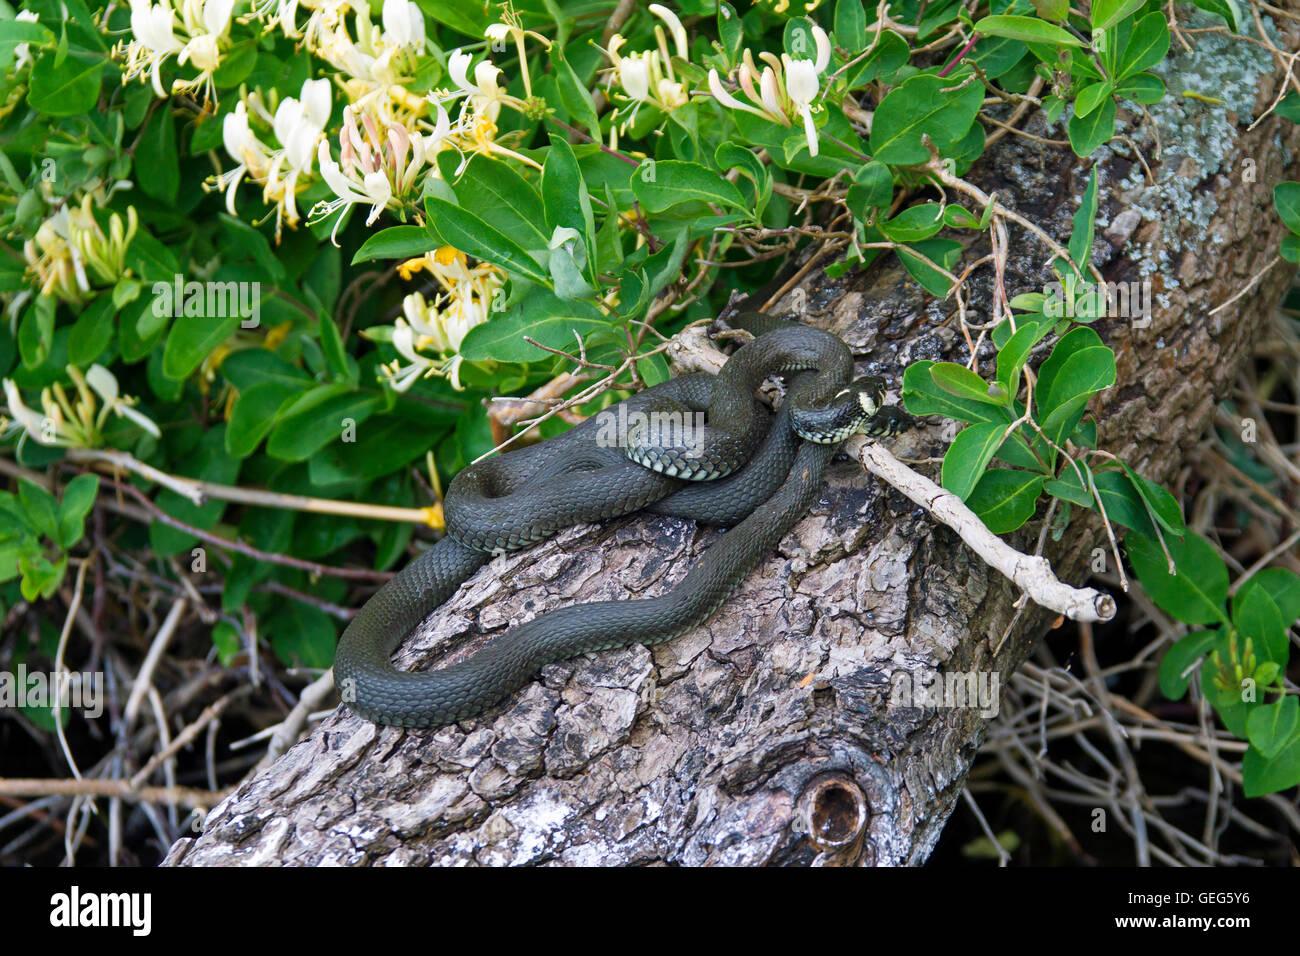 two grass snakes ringed snake water snake natrix natrix on